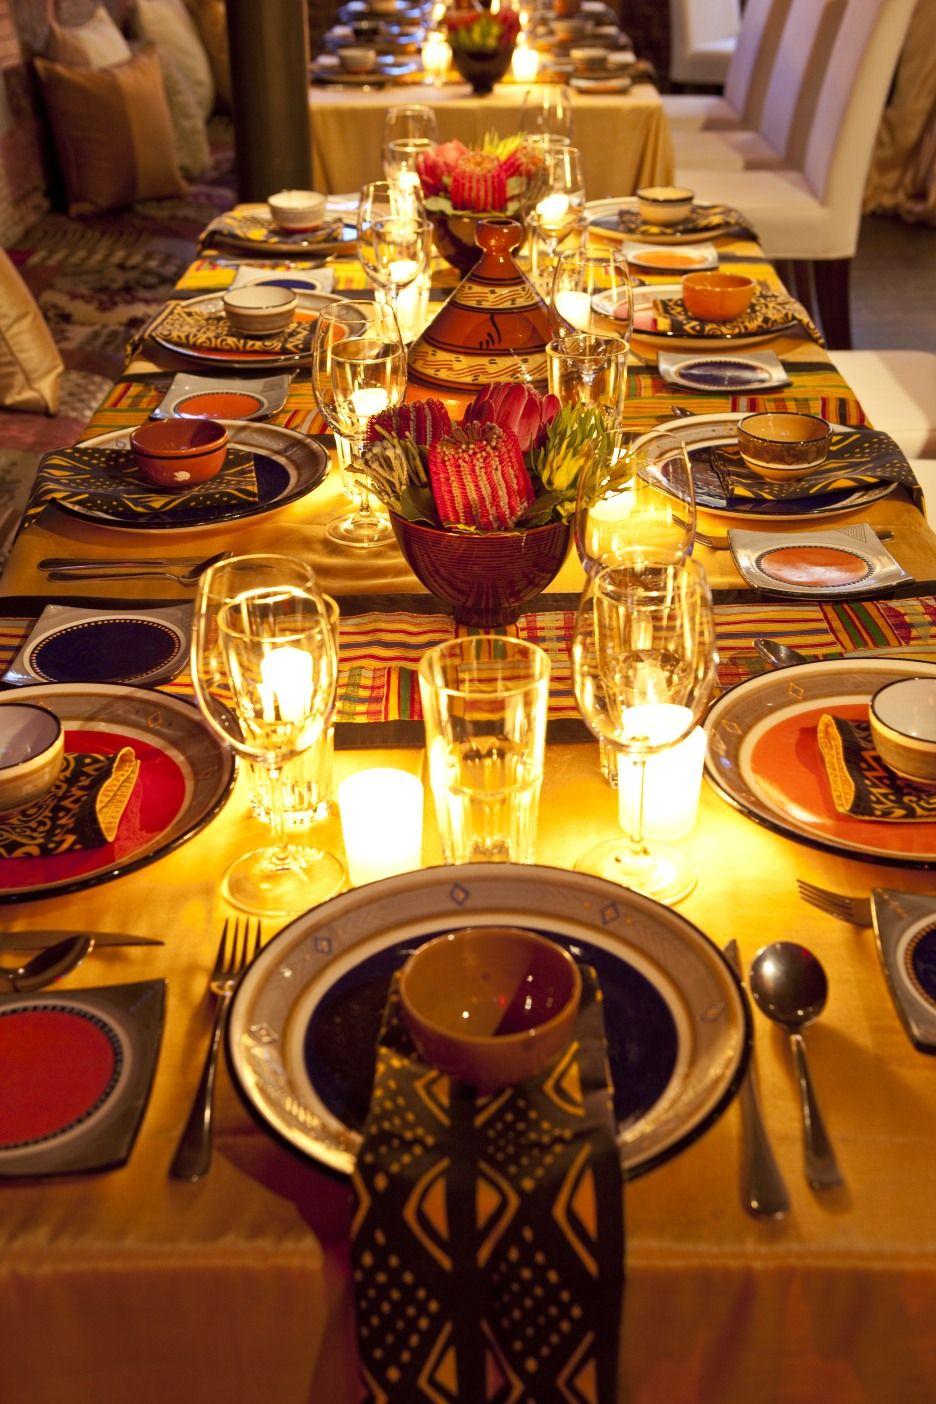 Zulu wedding decorations  A beautiful African table setting  Birthday ideas  Pinterest